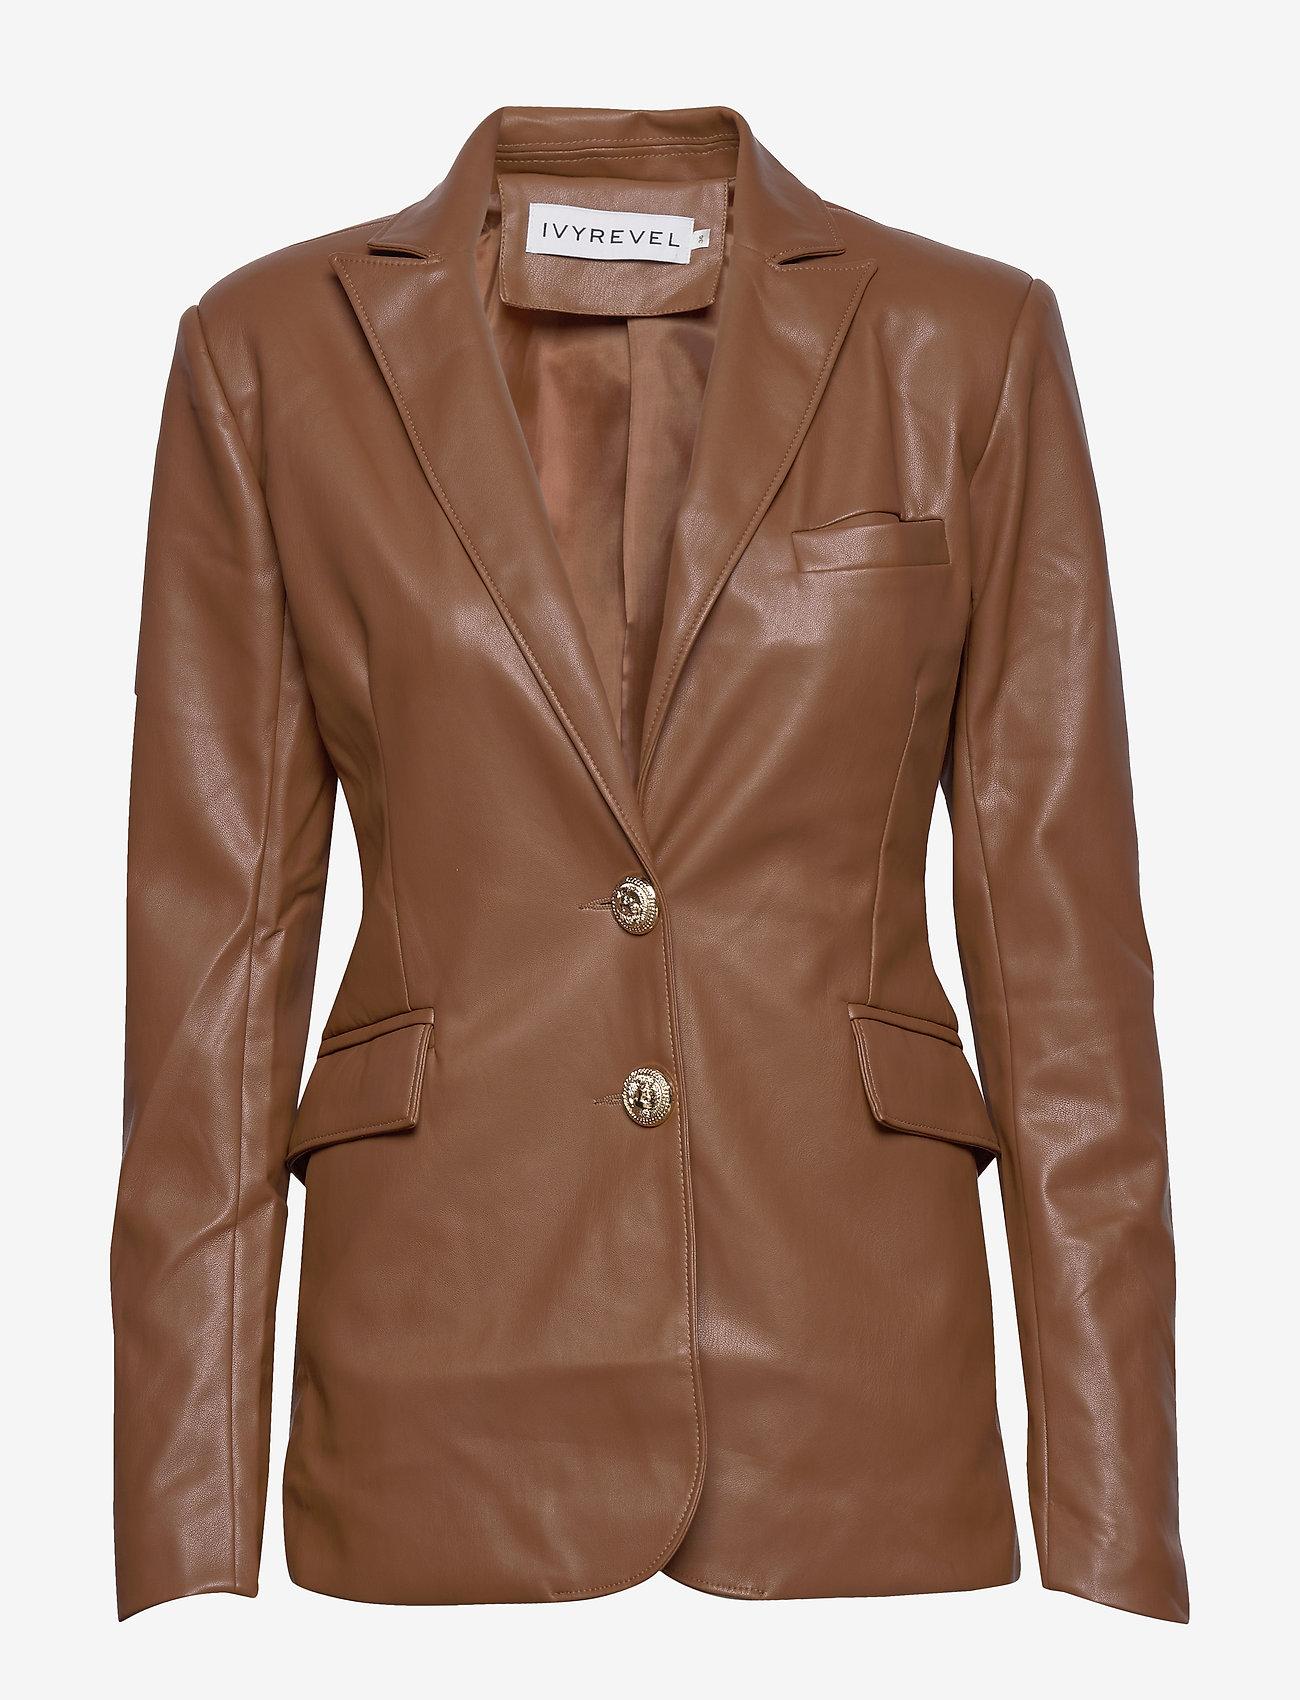 Ivyrevel - SLIM BELTED PU BLAZER - leather jackets - cognac - 1